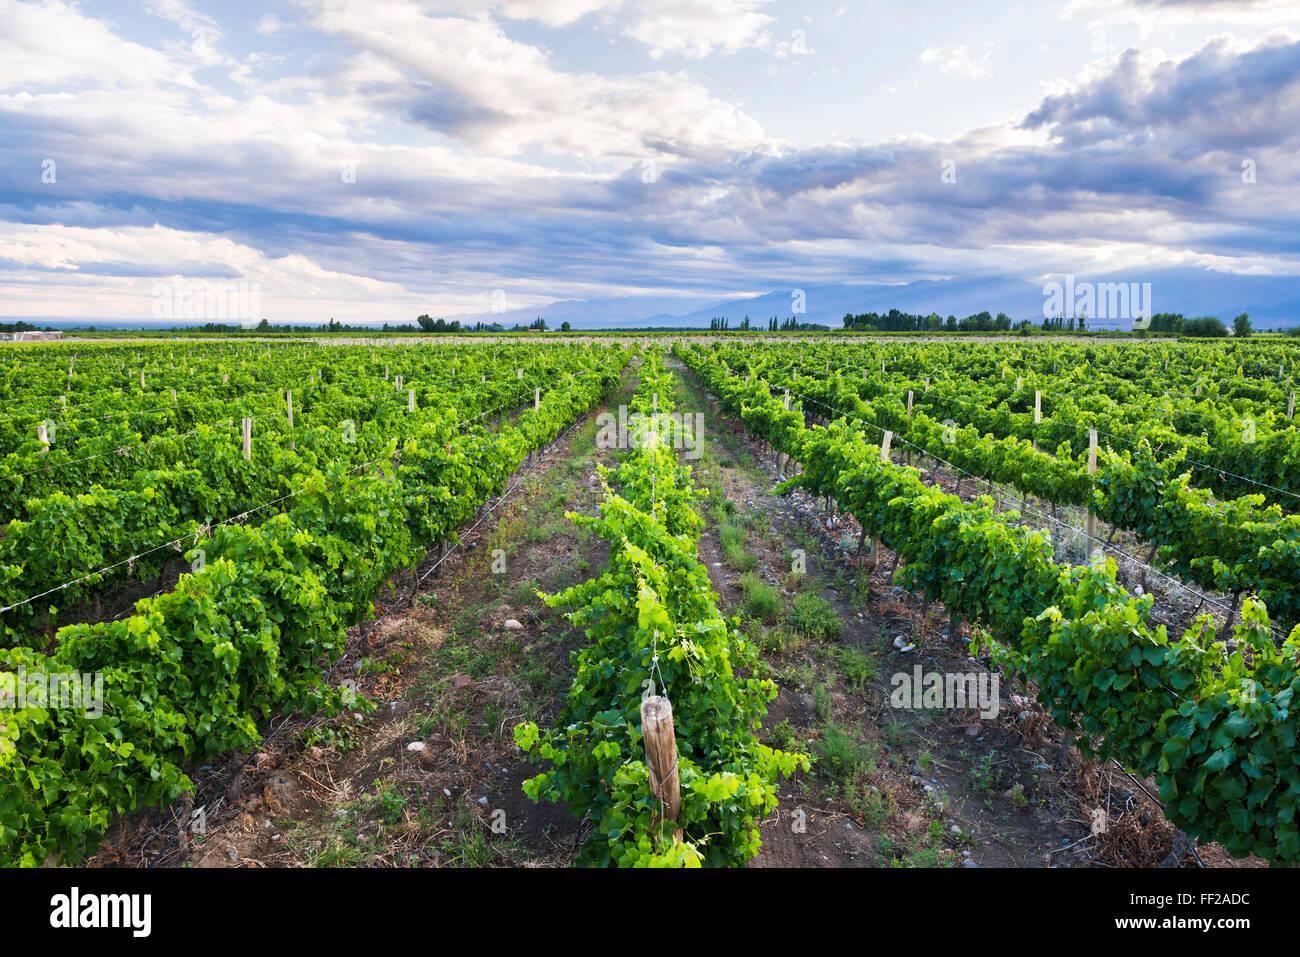 Vineyards at Bodega RMa AzuRM, a winery in Uco VaRMRMey (VaRMRMe de Uco), a wine region in Mendoza Province, Argentina, - Stock Image